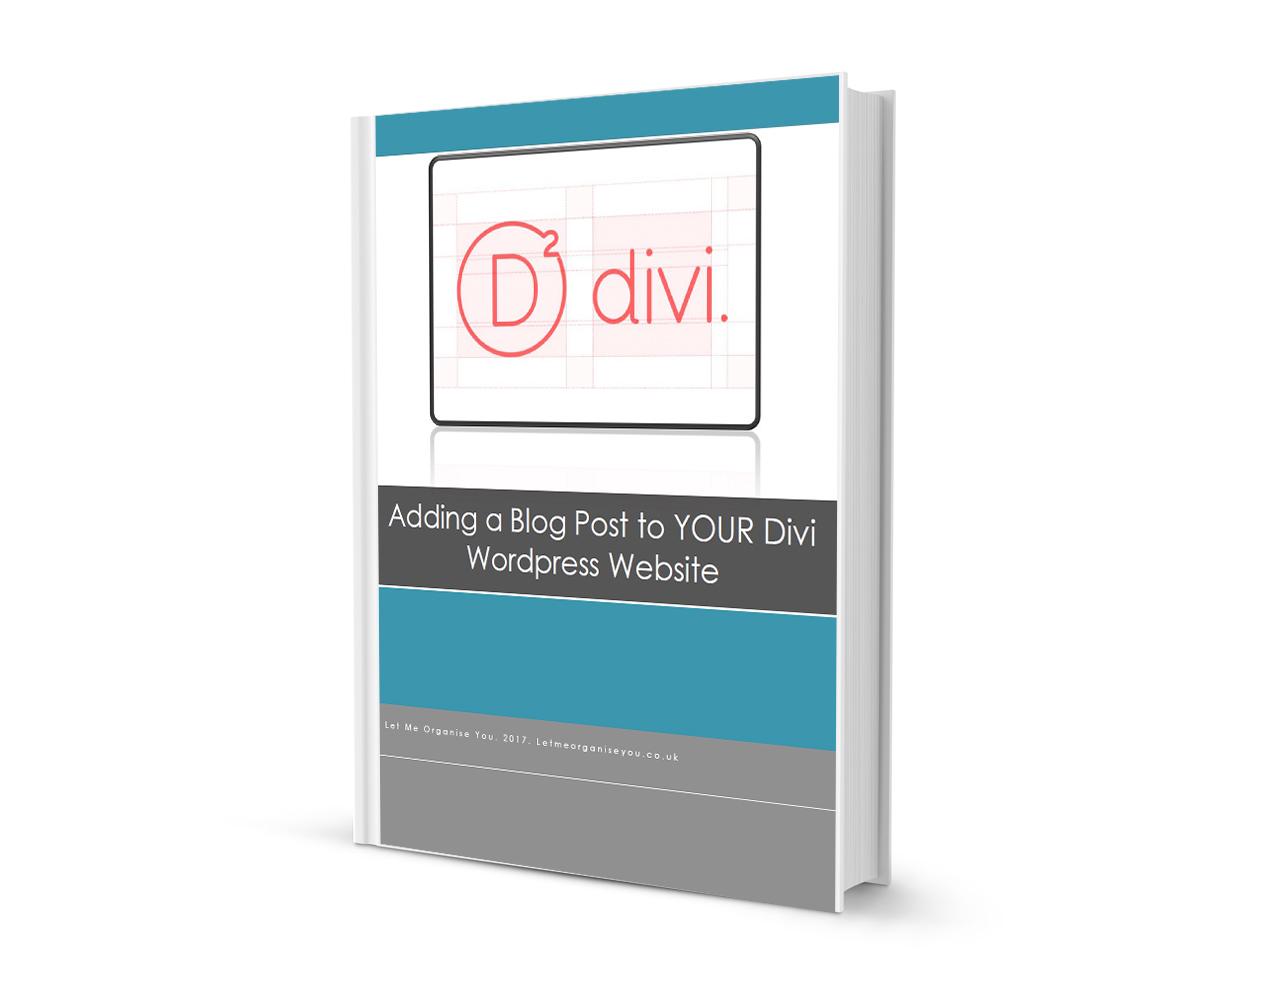 divi blog ebook cover 2017